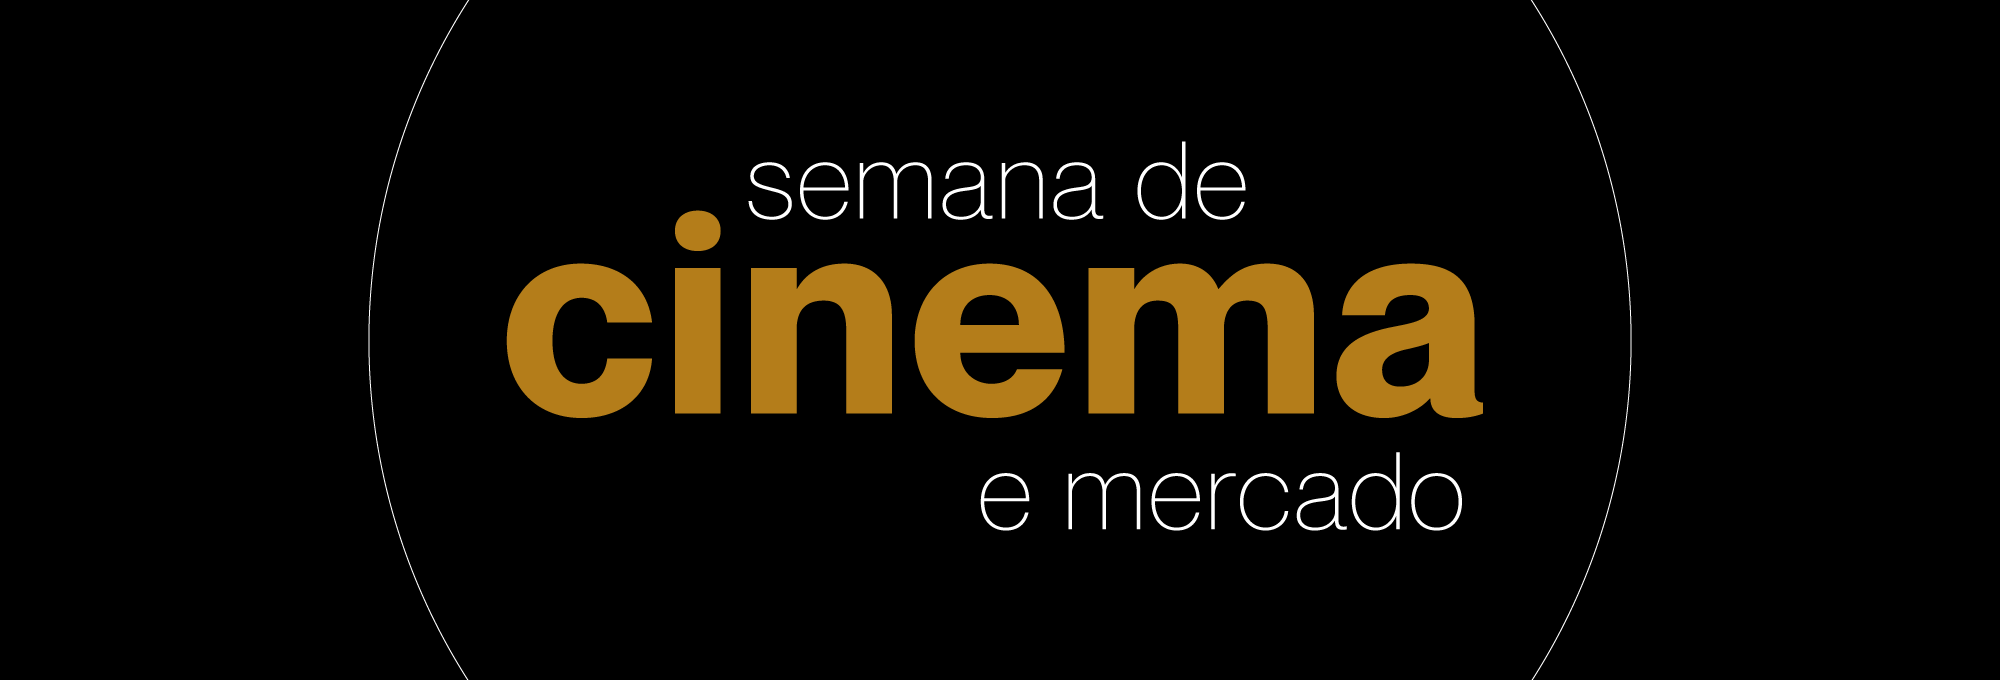 SEMANA DE CINEMA E MERCADO ONLINE